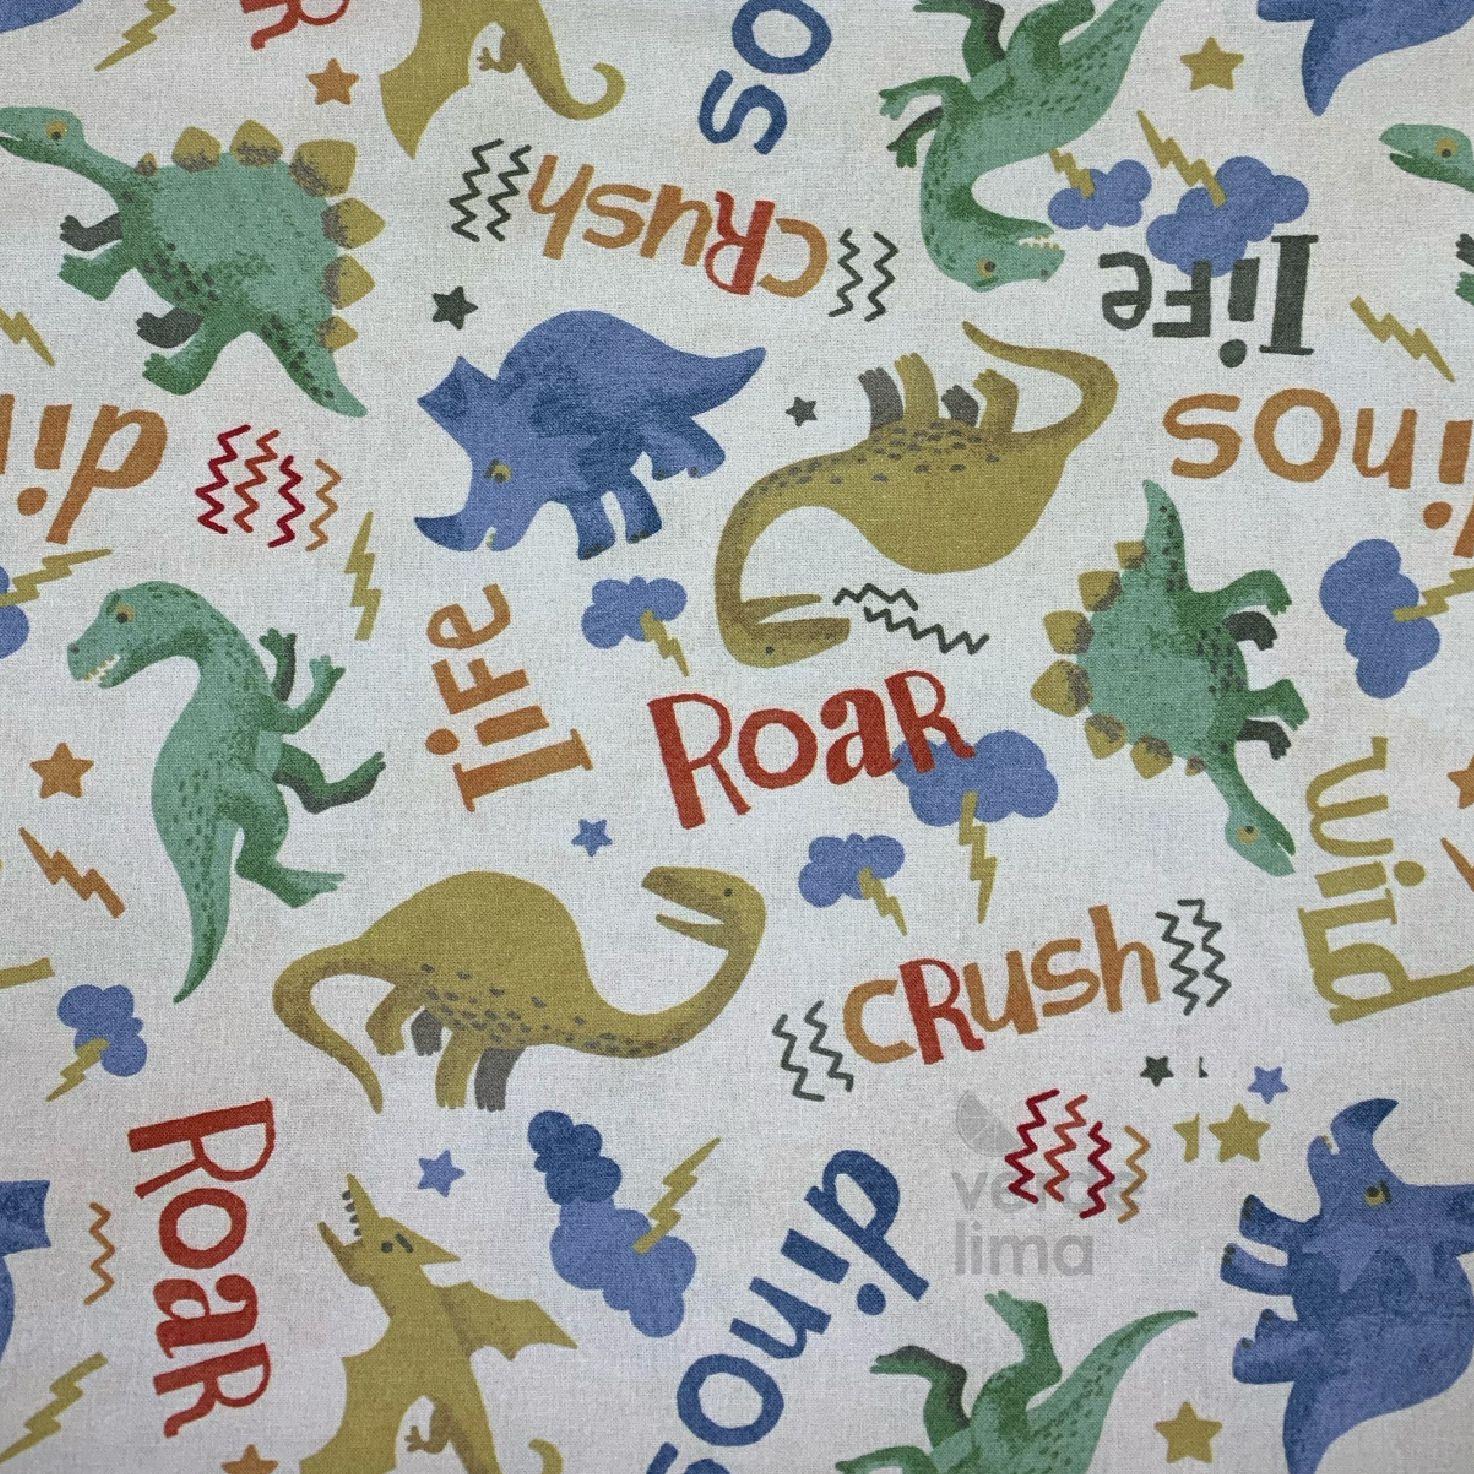 Roar - dinossauros coloridos